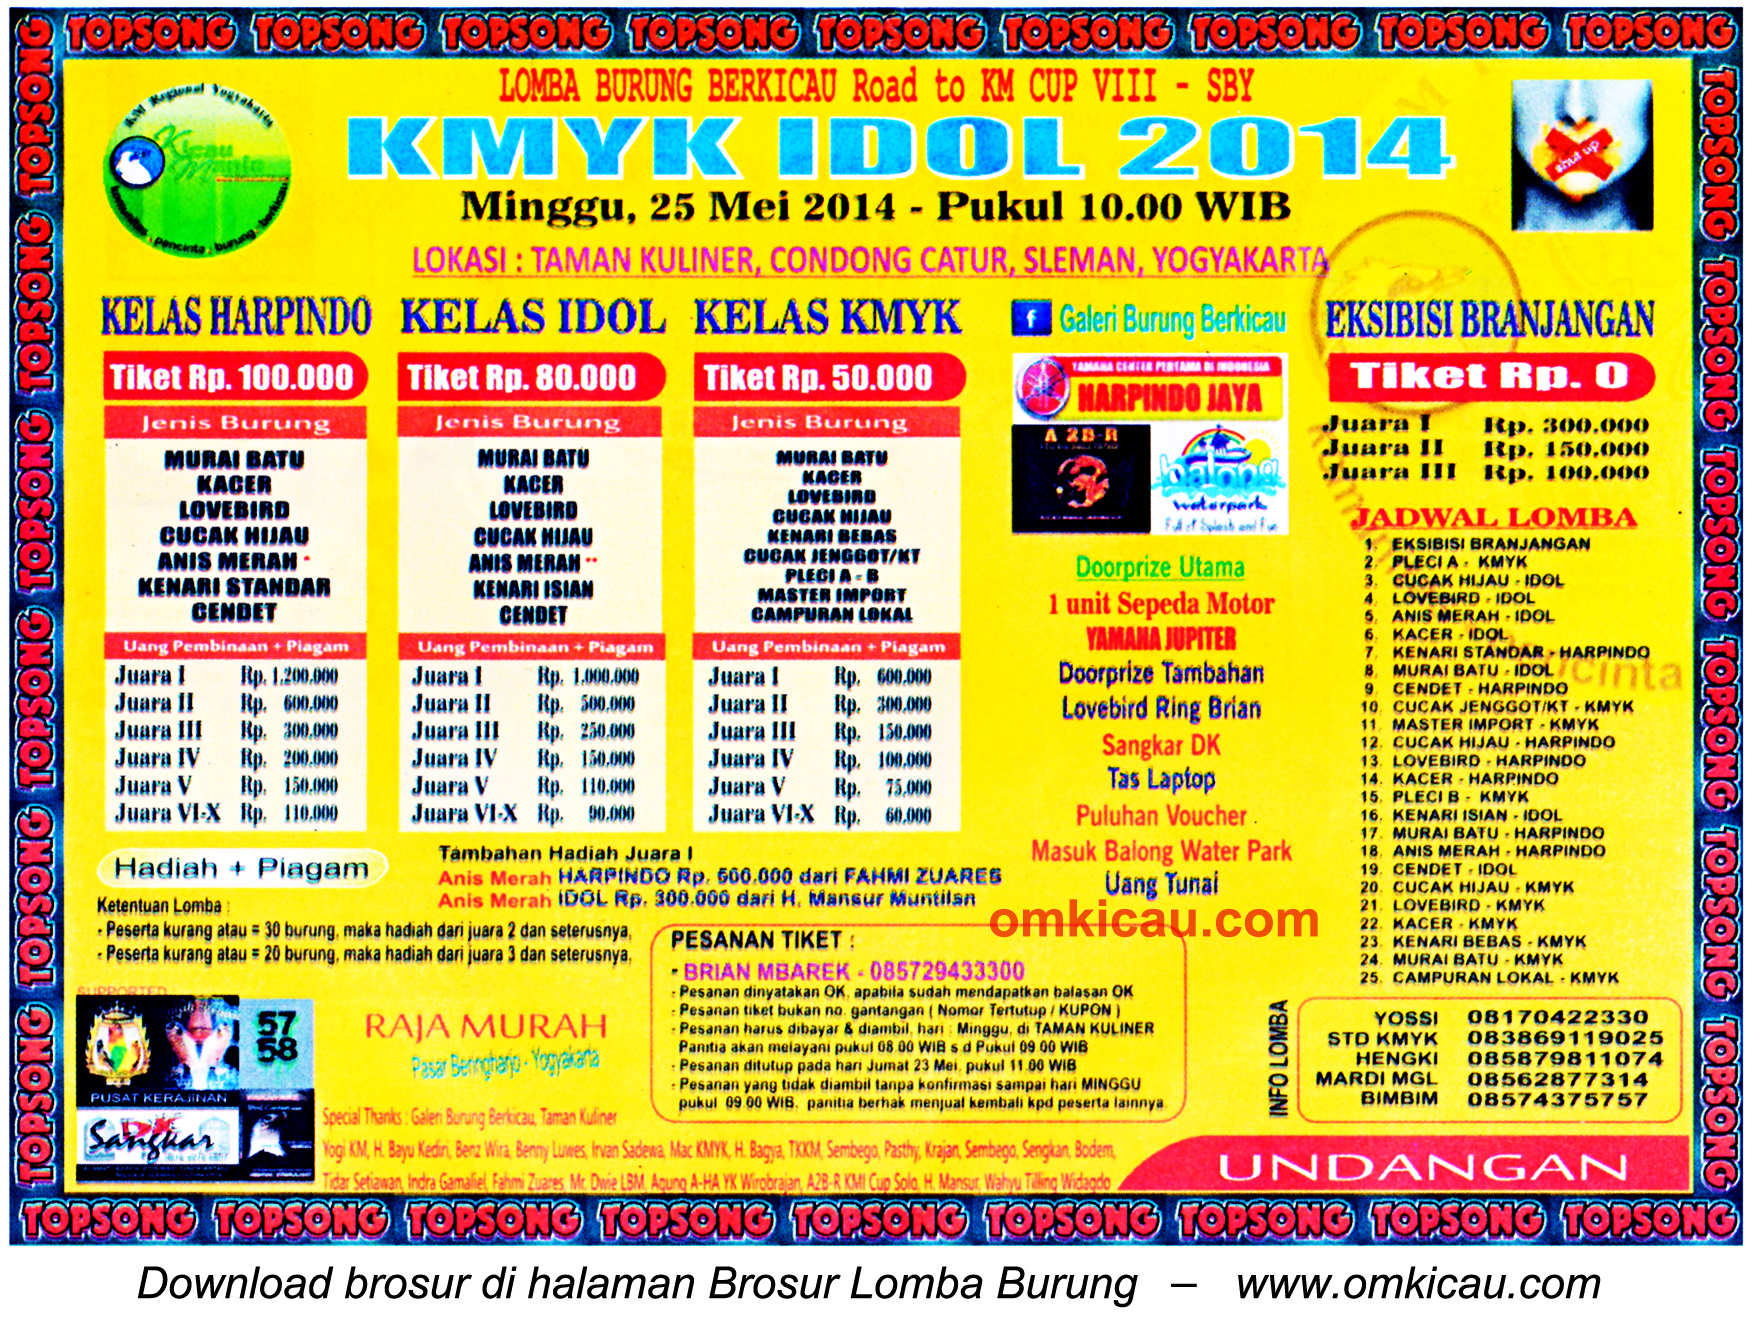 Brosur Lomba Burung Berkicau KMYK Idol 2014, Jogja, 25 Mei 2014